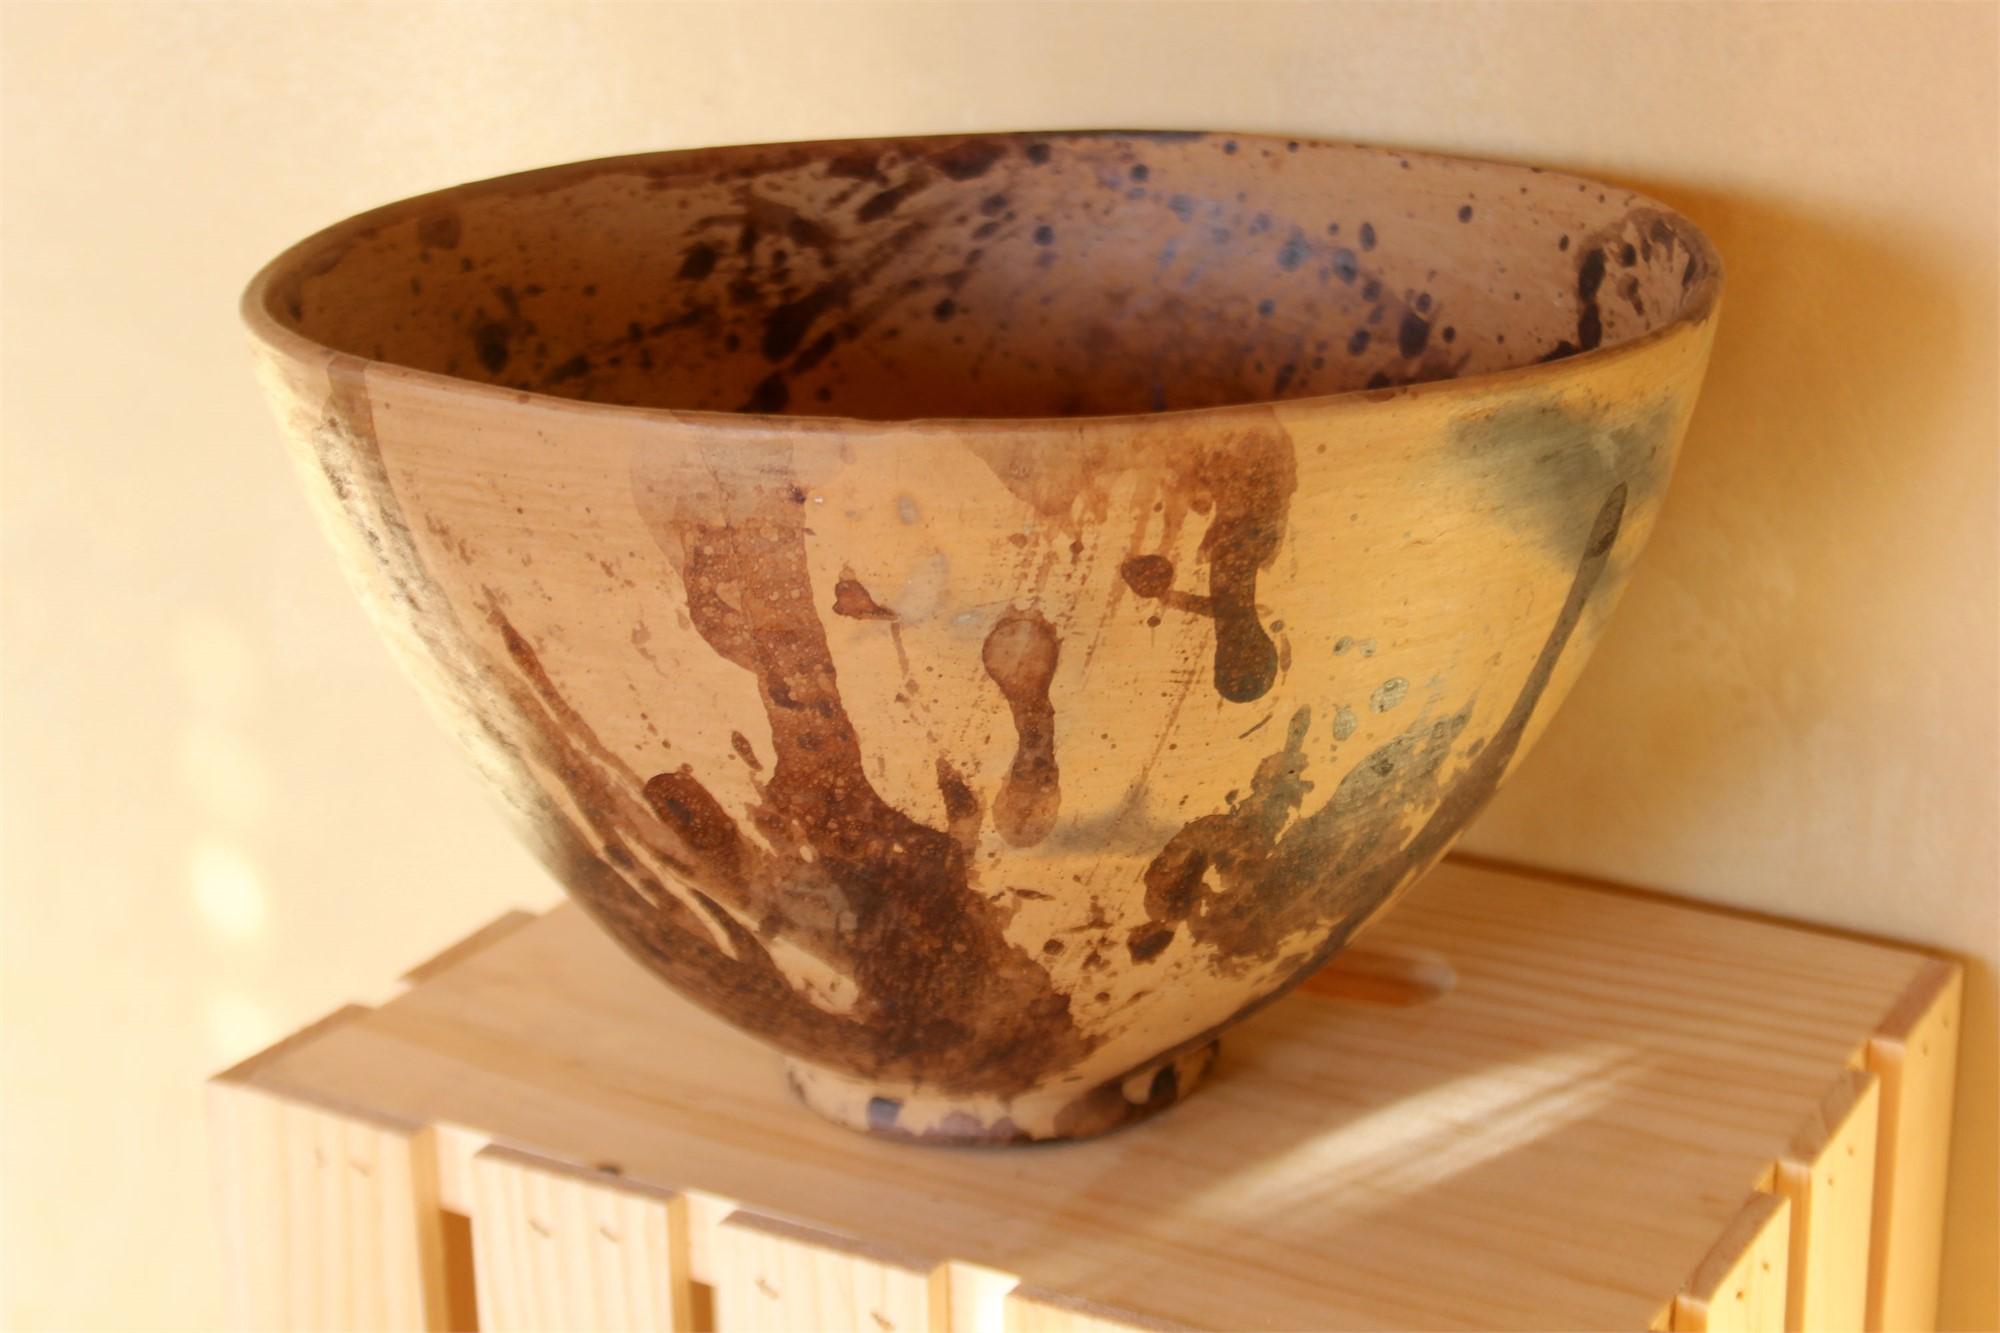 Tonaltepec Bowl Extra Large by Colectivo 1050